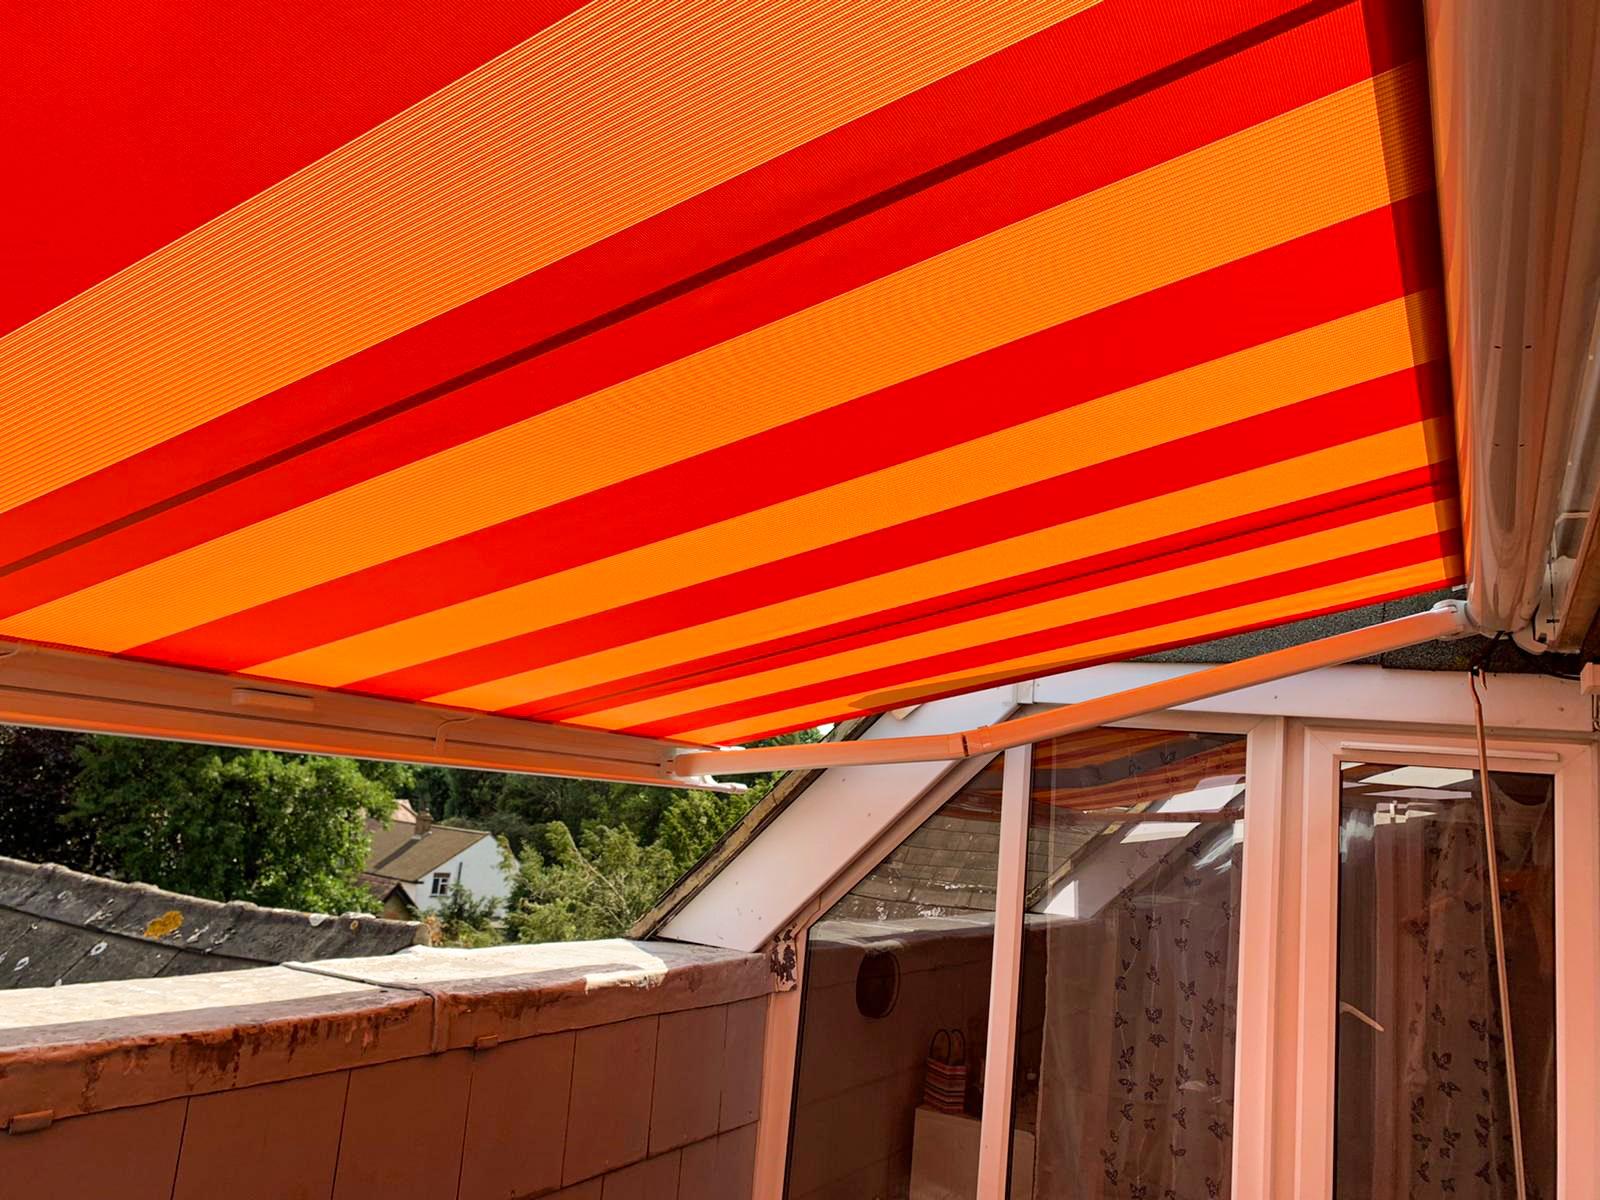 Markilux 990 Awning with Sunsilk Fabric